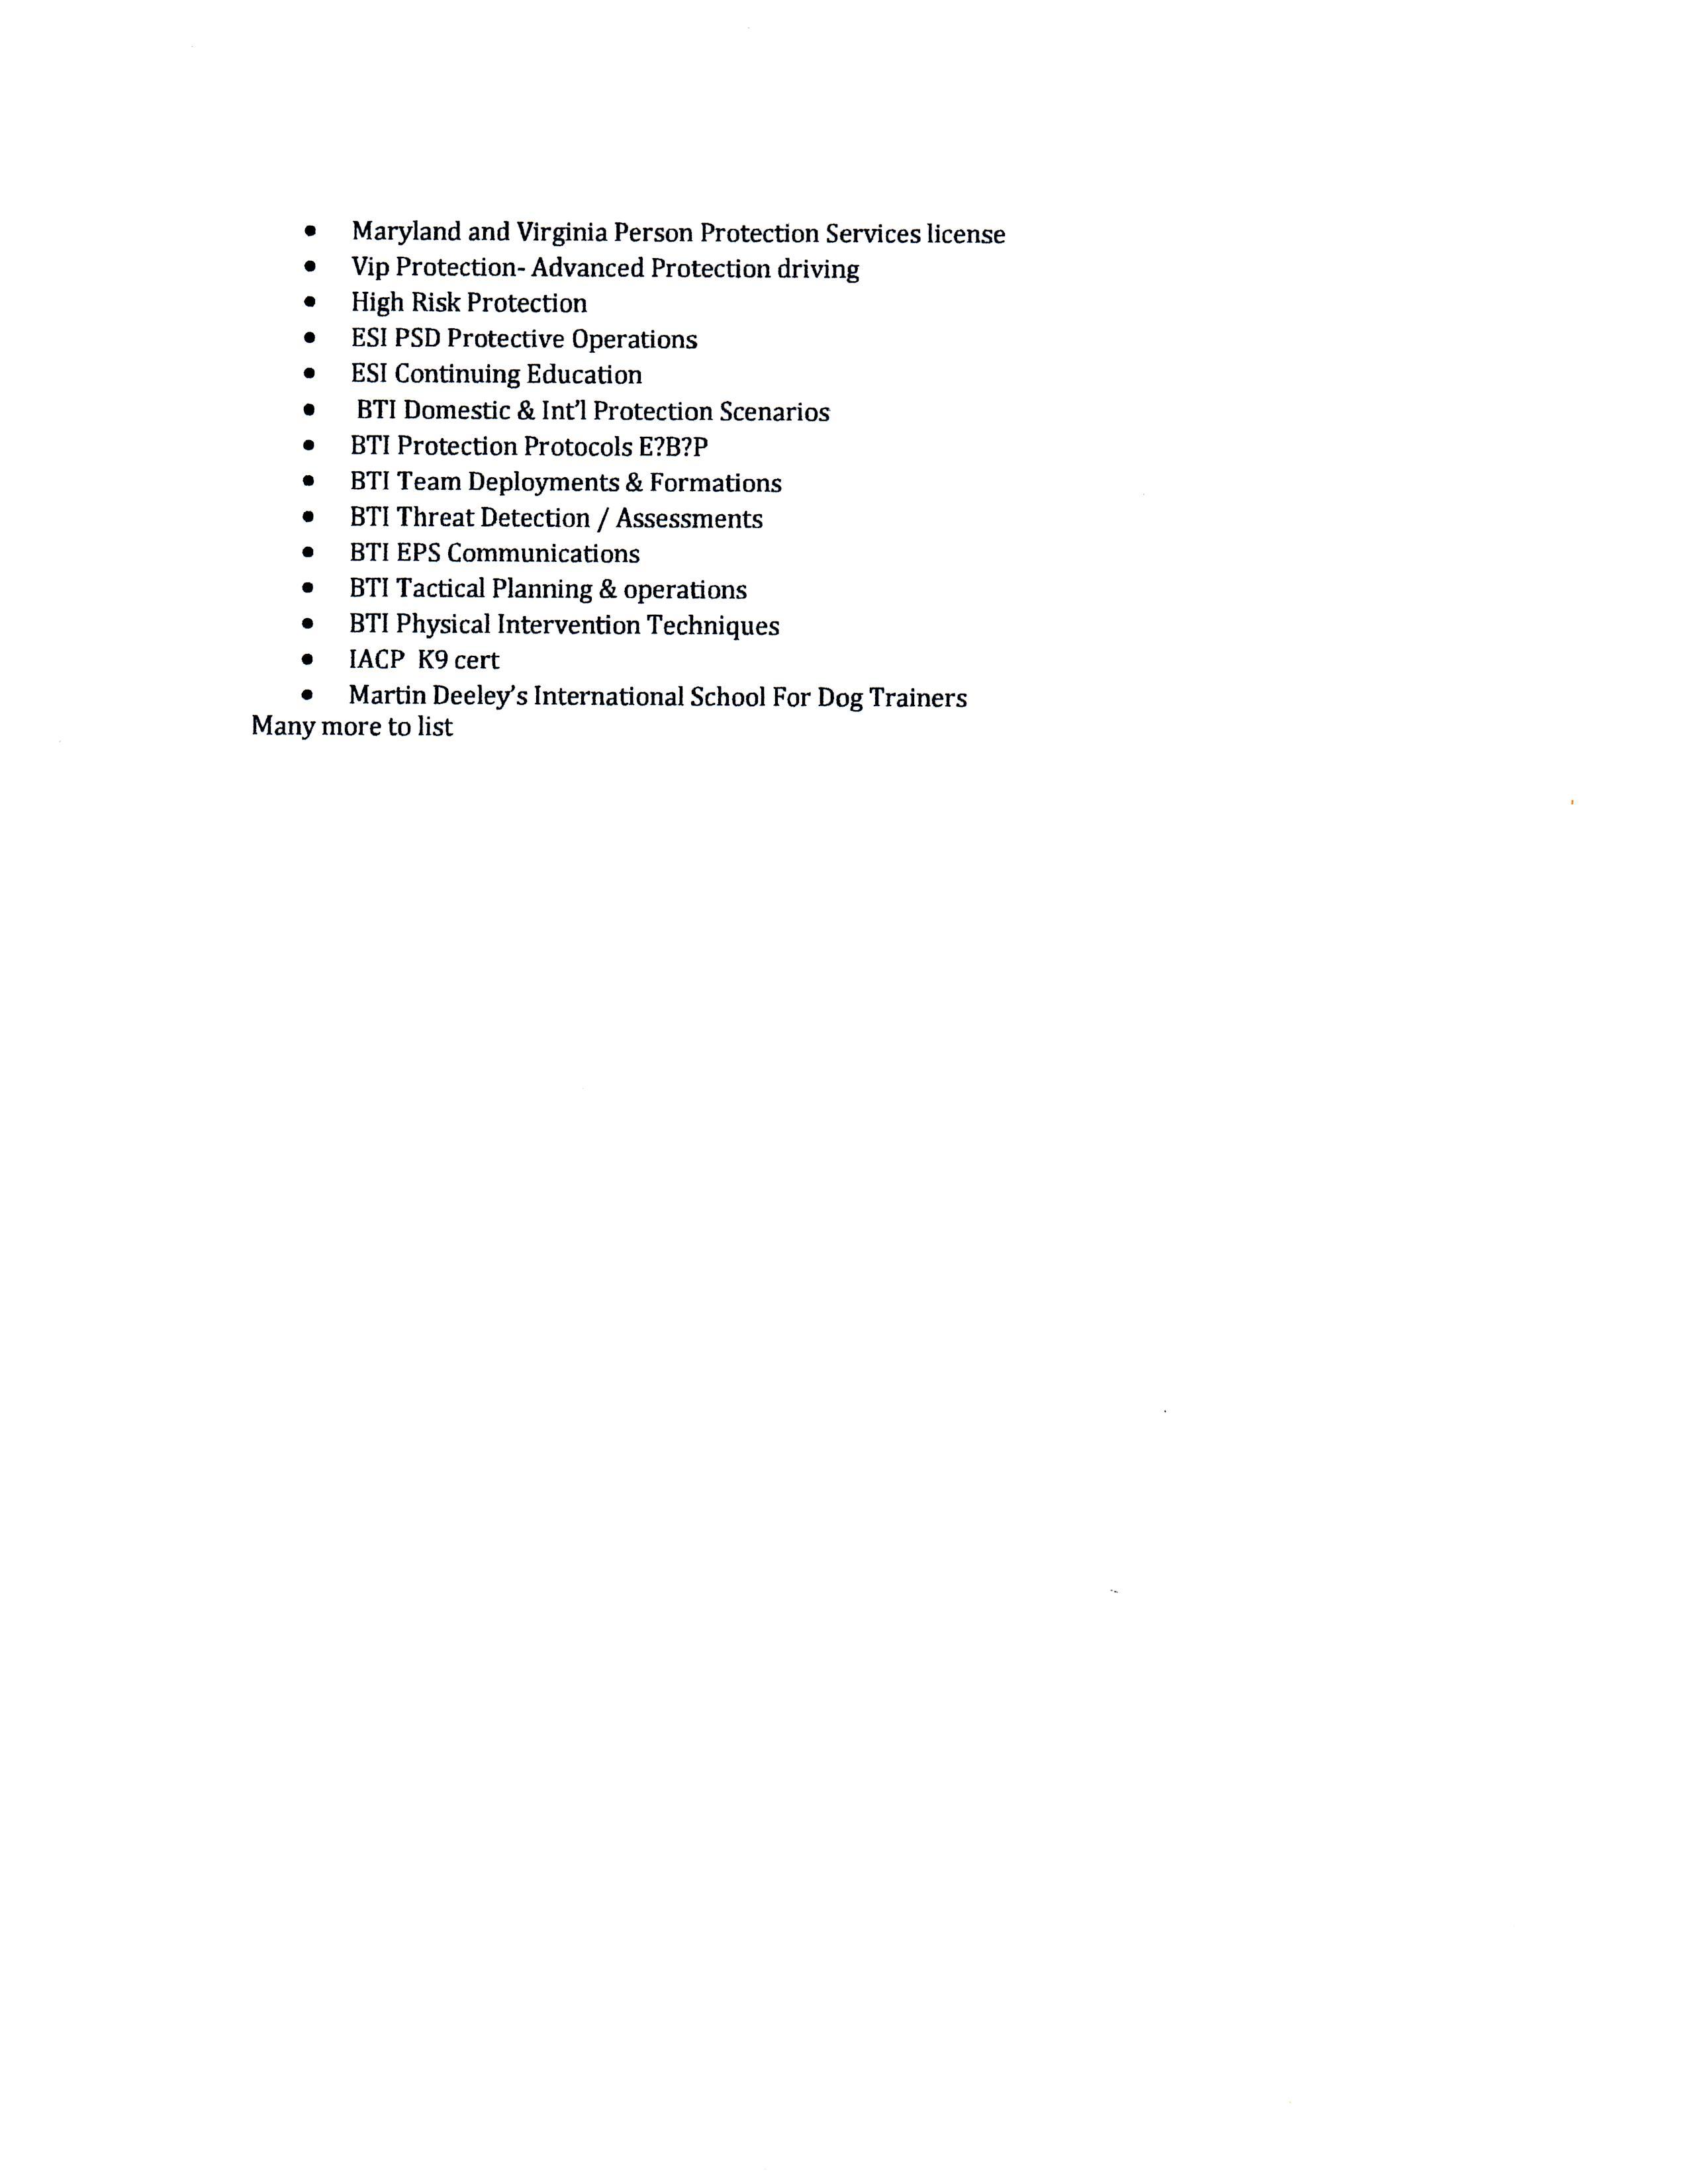 cisco cover letter sales manager resume sample cover esi claim letter